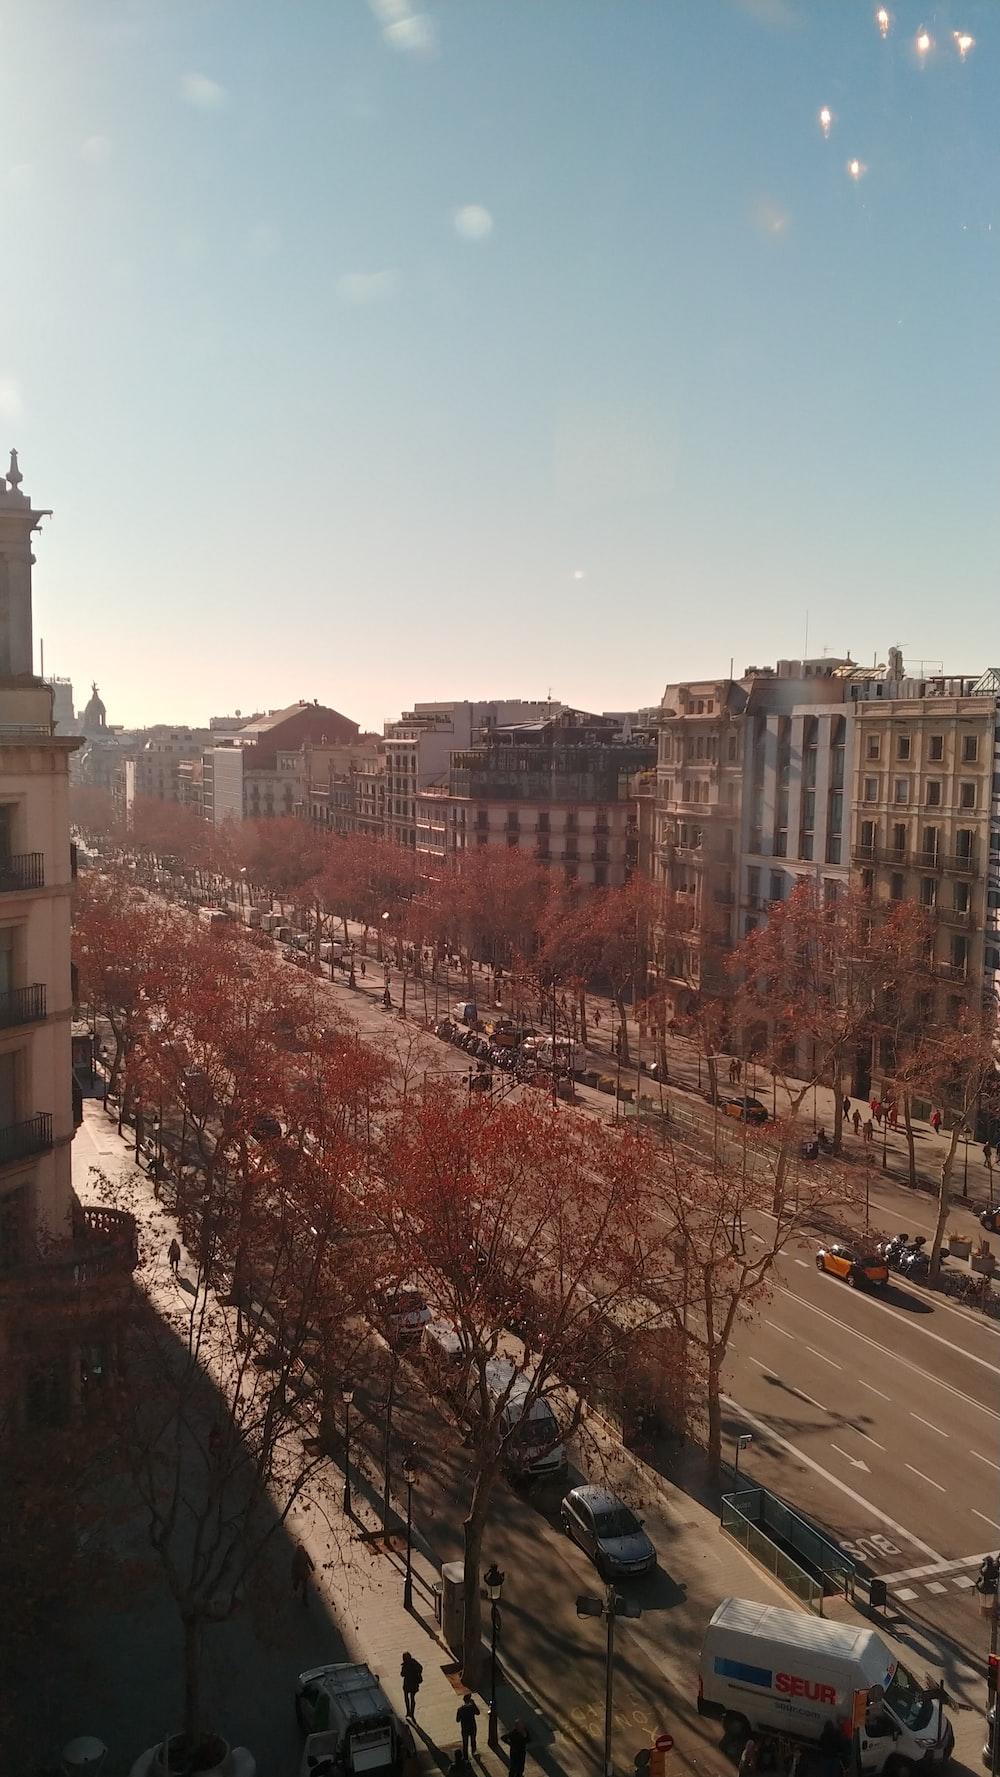 bird's-eye view photo of concrete pave street